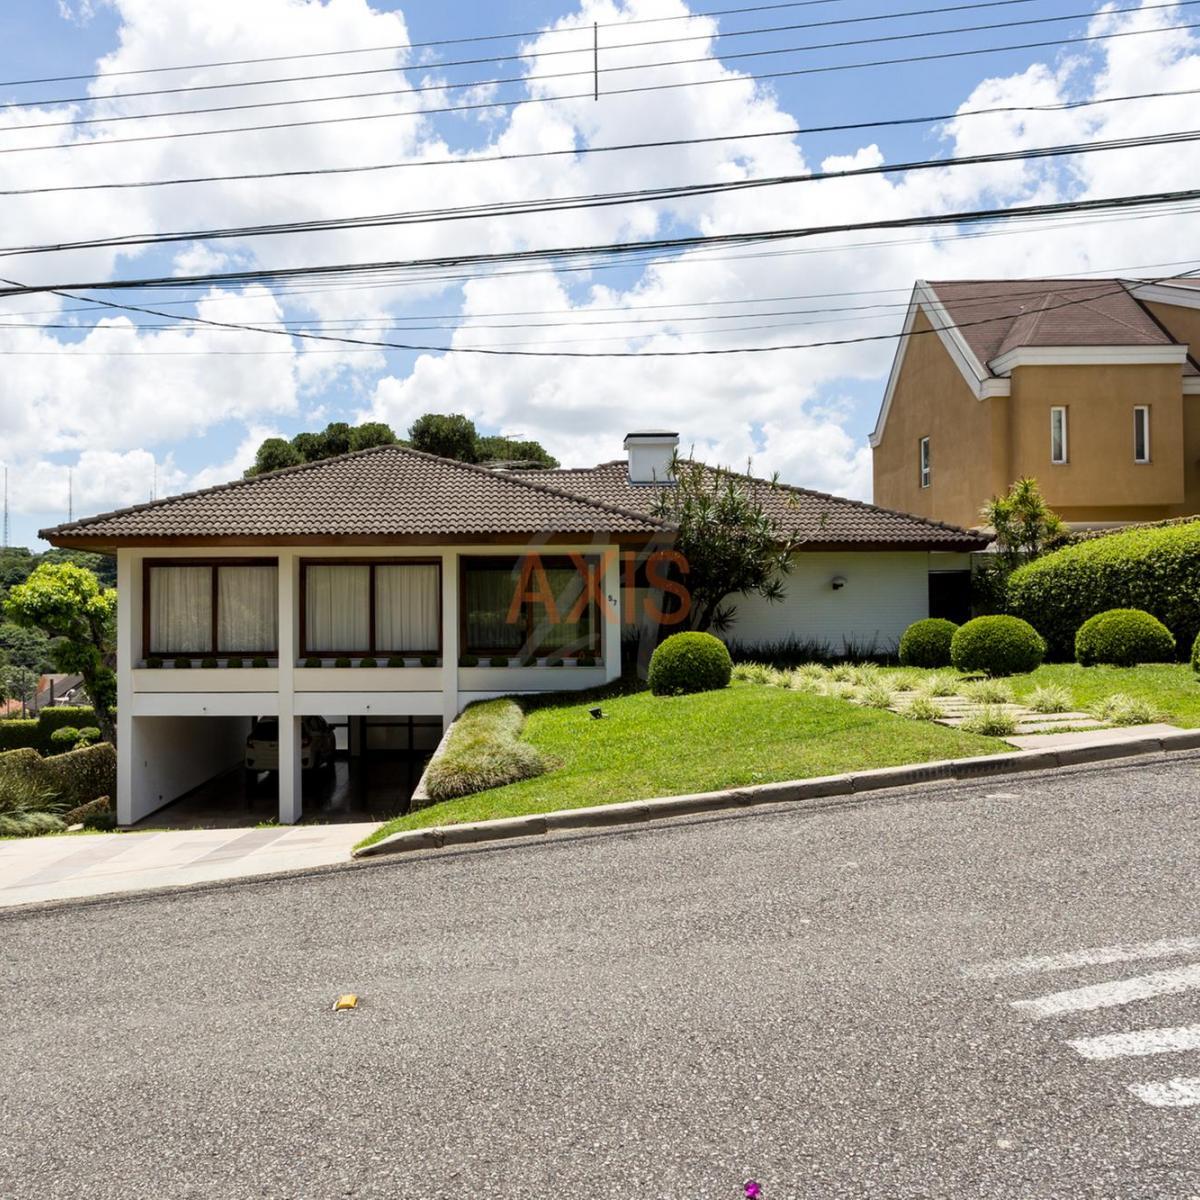 http://www.infocenterhost2.com.br/crm/fotosimovel/195602/70925210-casa-em-condominio-curitiba-sao-lourenco_marcadagua.jpg